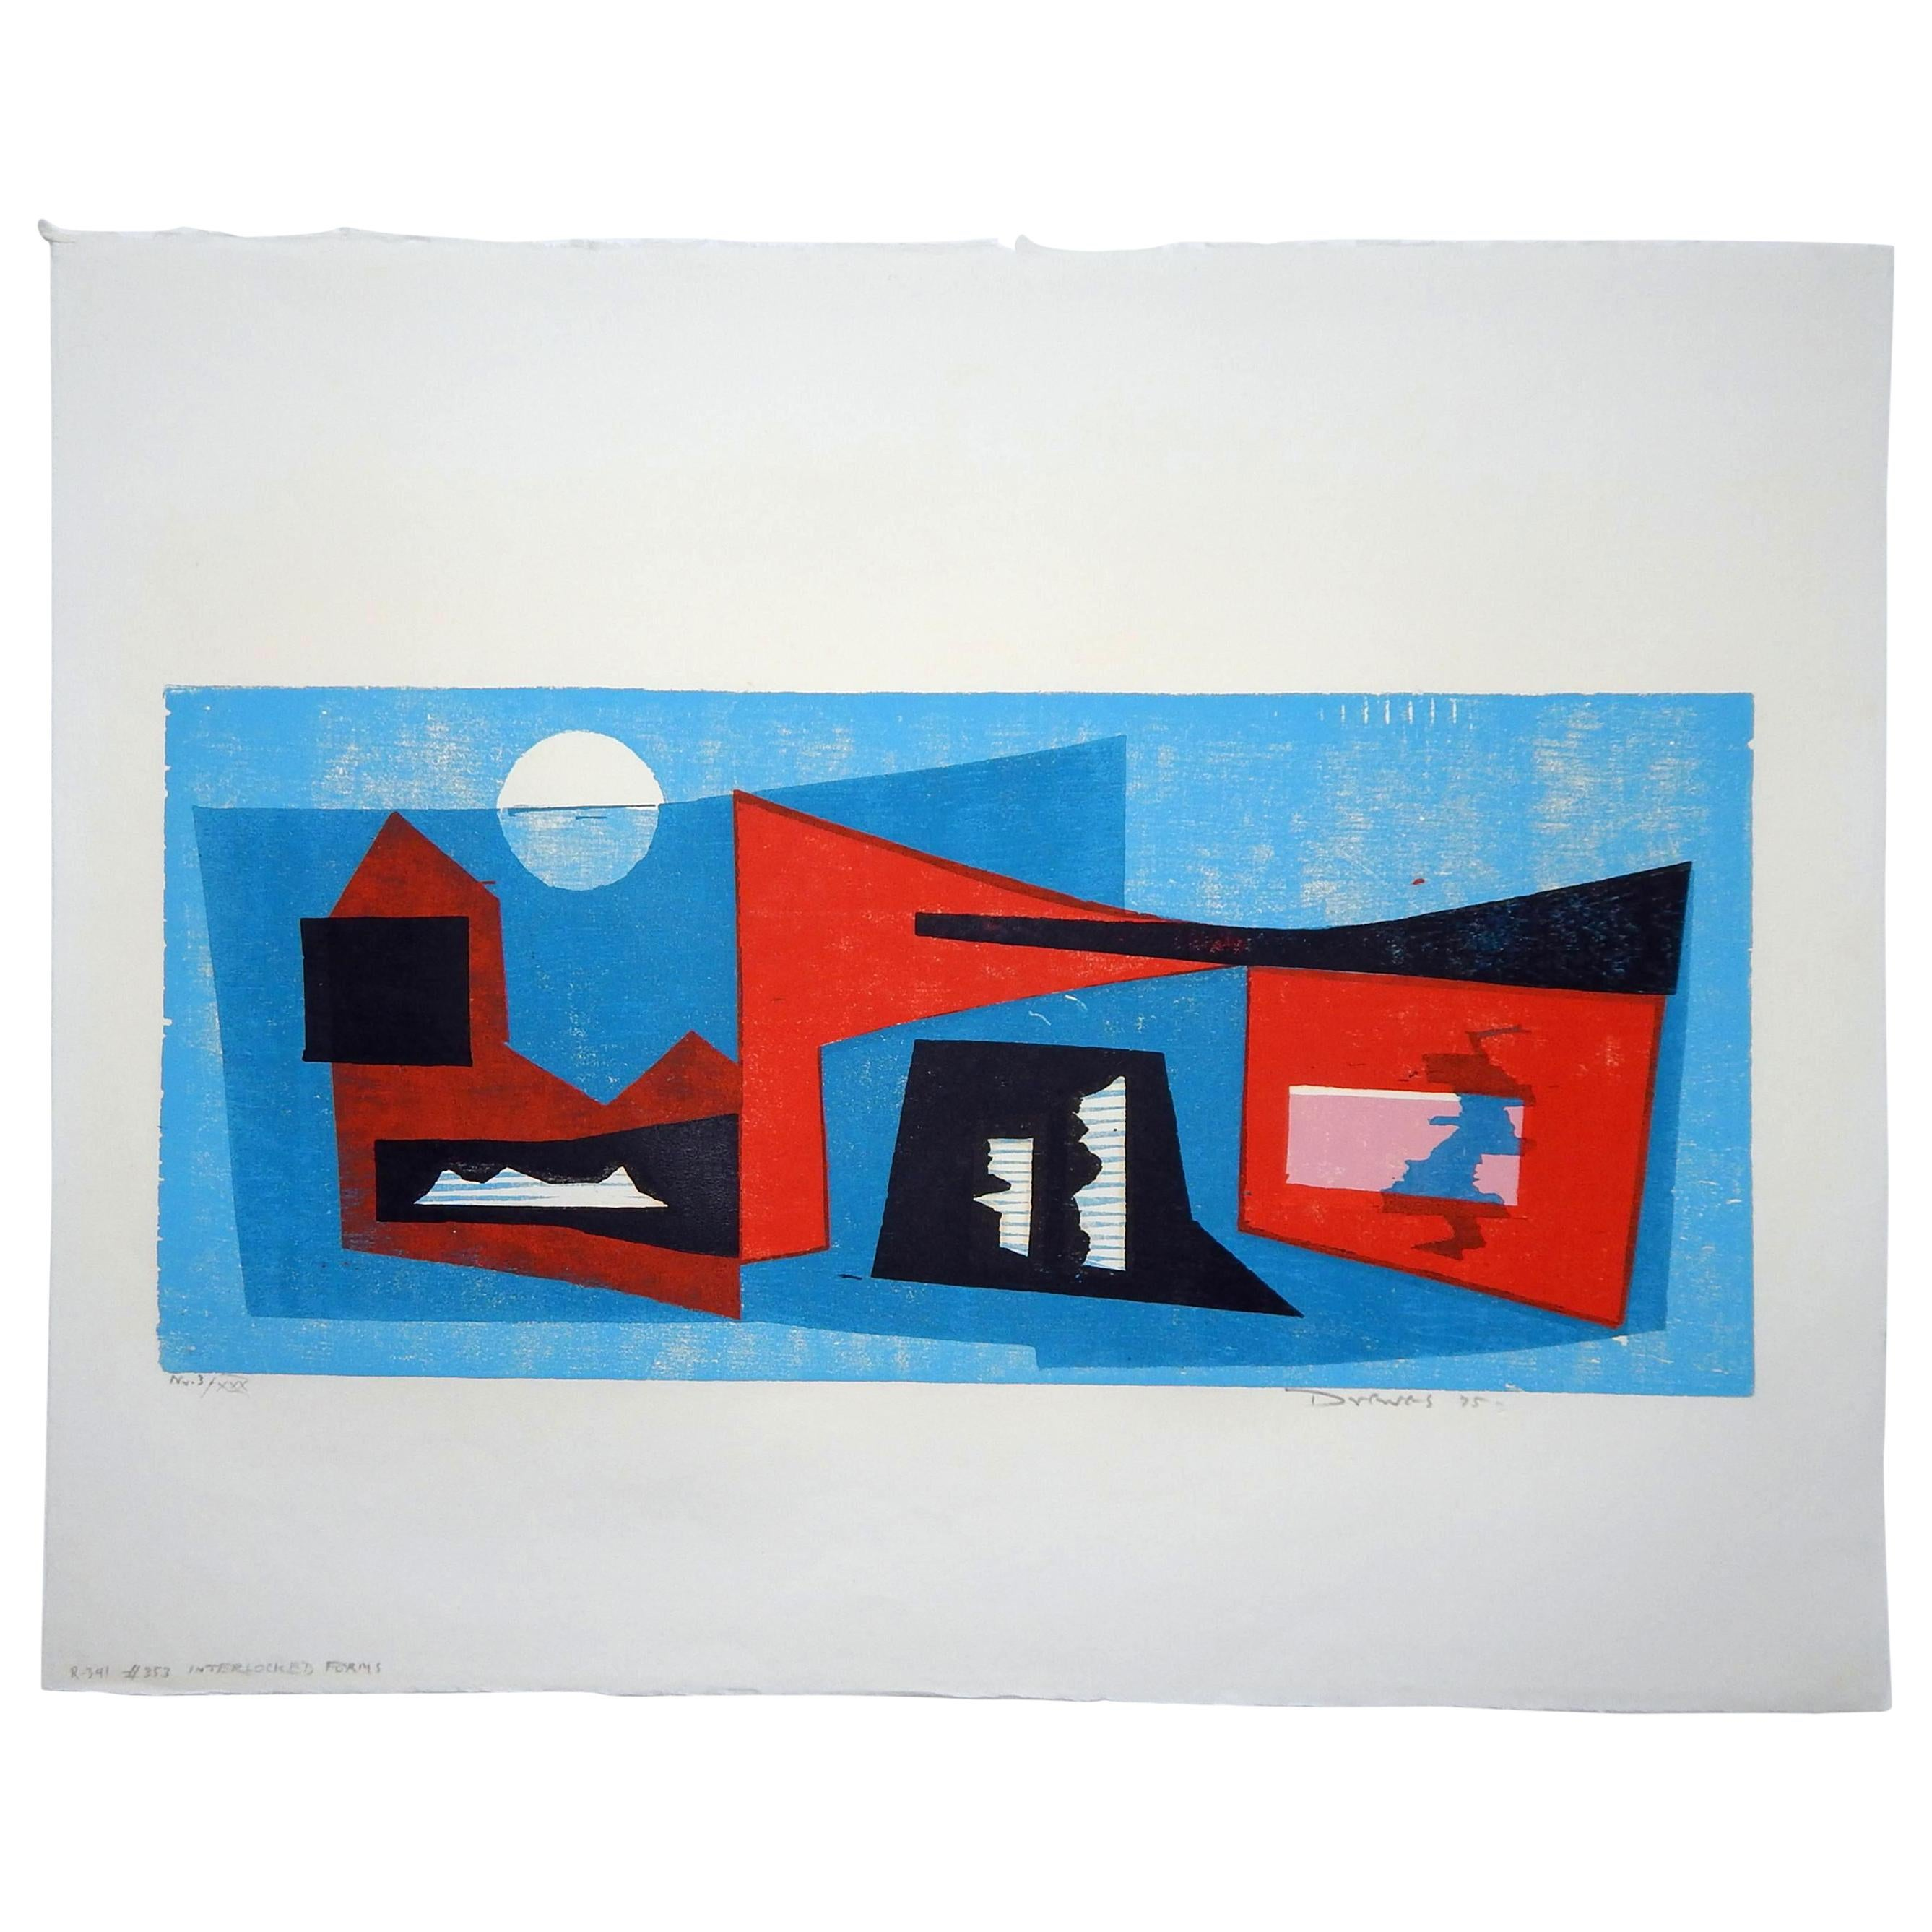 Werner Drewes Bauhaus Artist Color Woodblock, 1975, Enterlocked Forms